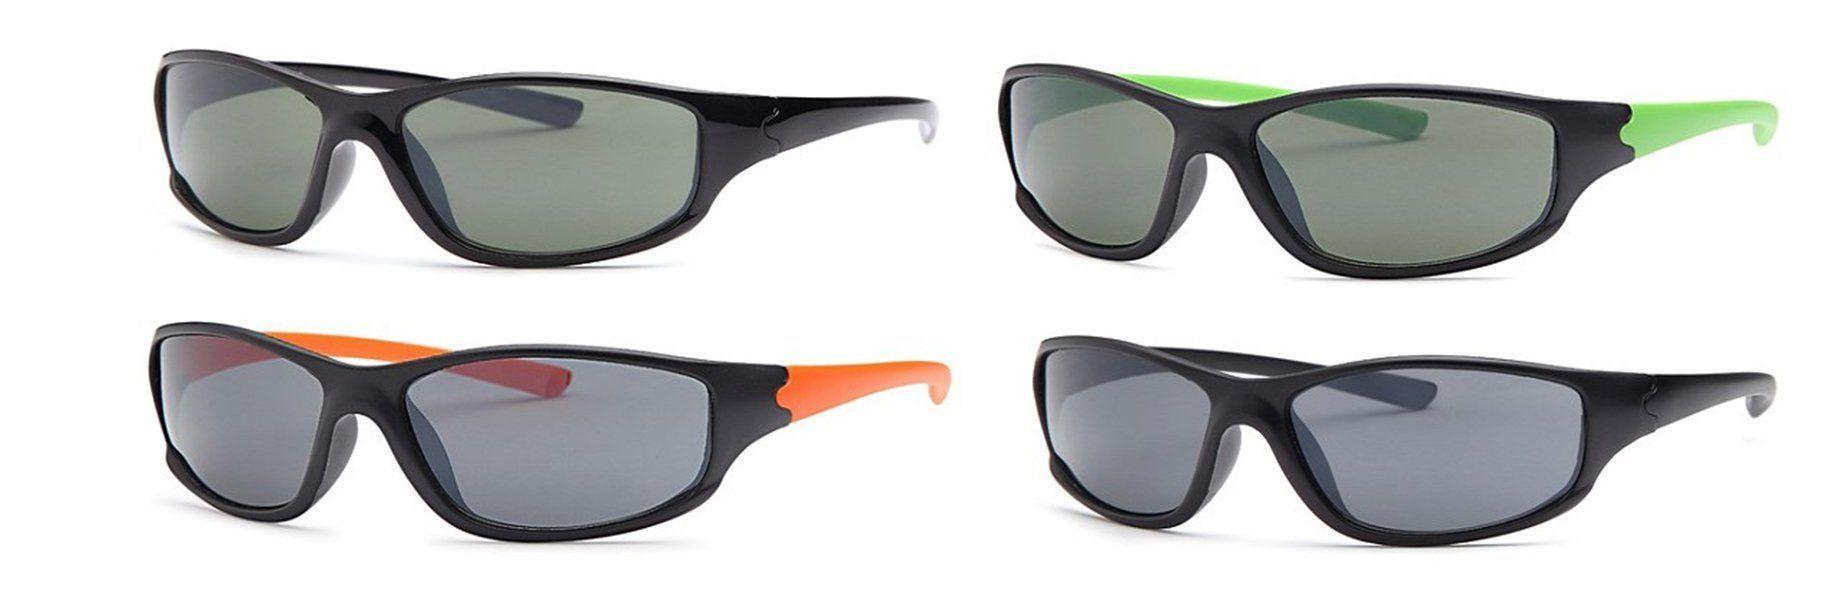 AFONiE Kids Sports Sunglasses 4 Pack in 2020 Sports